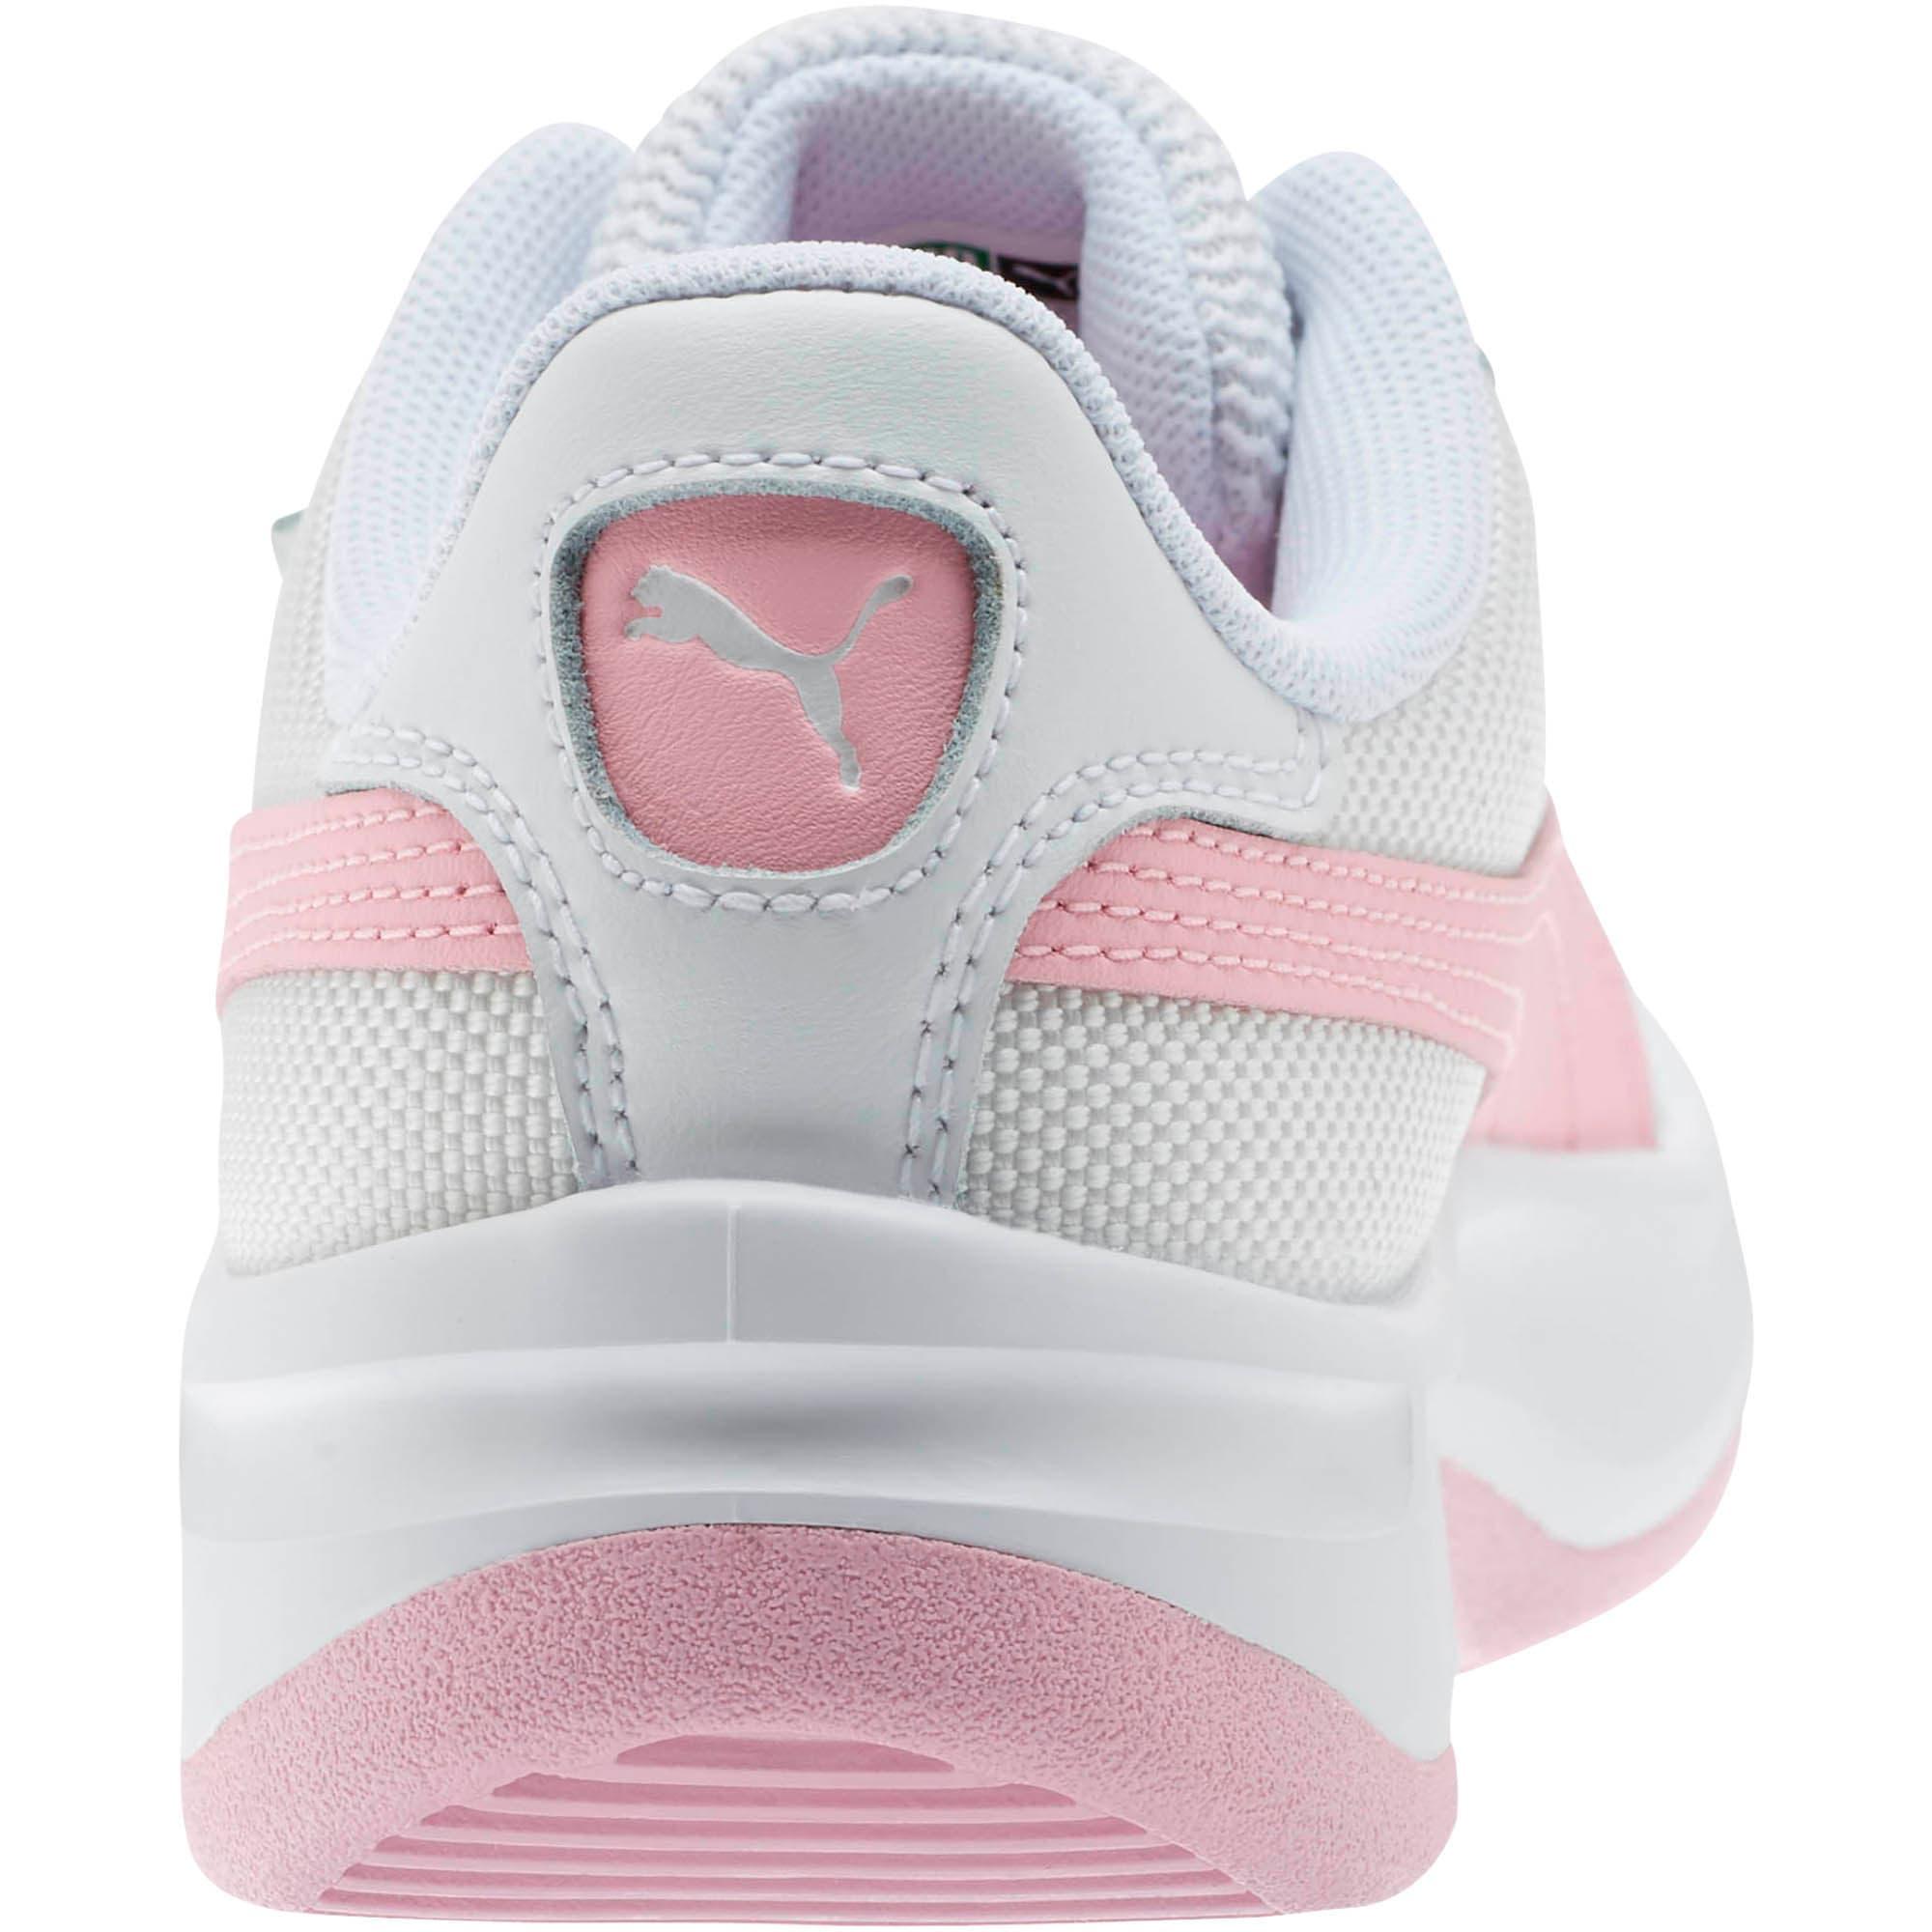 Thumbnail 3 of California Sneakers JR, Puma Wht-Pale Pink-Puma Wht, medium